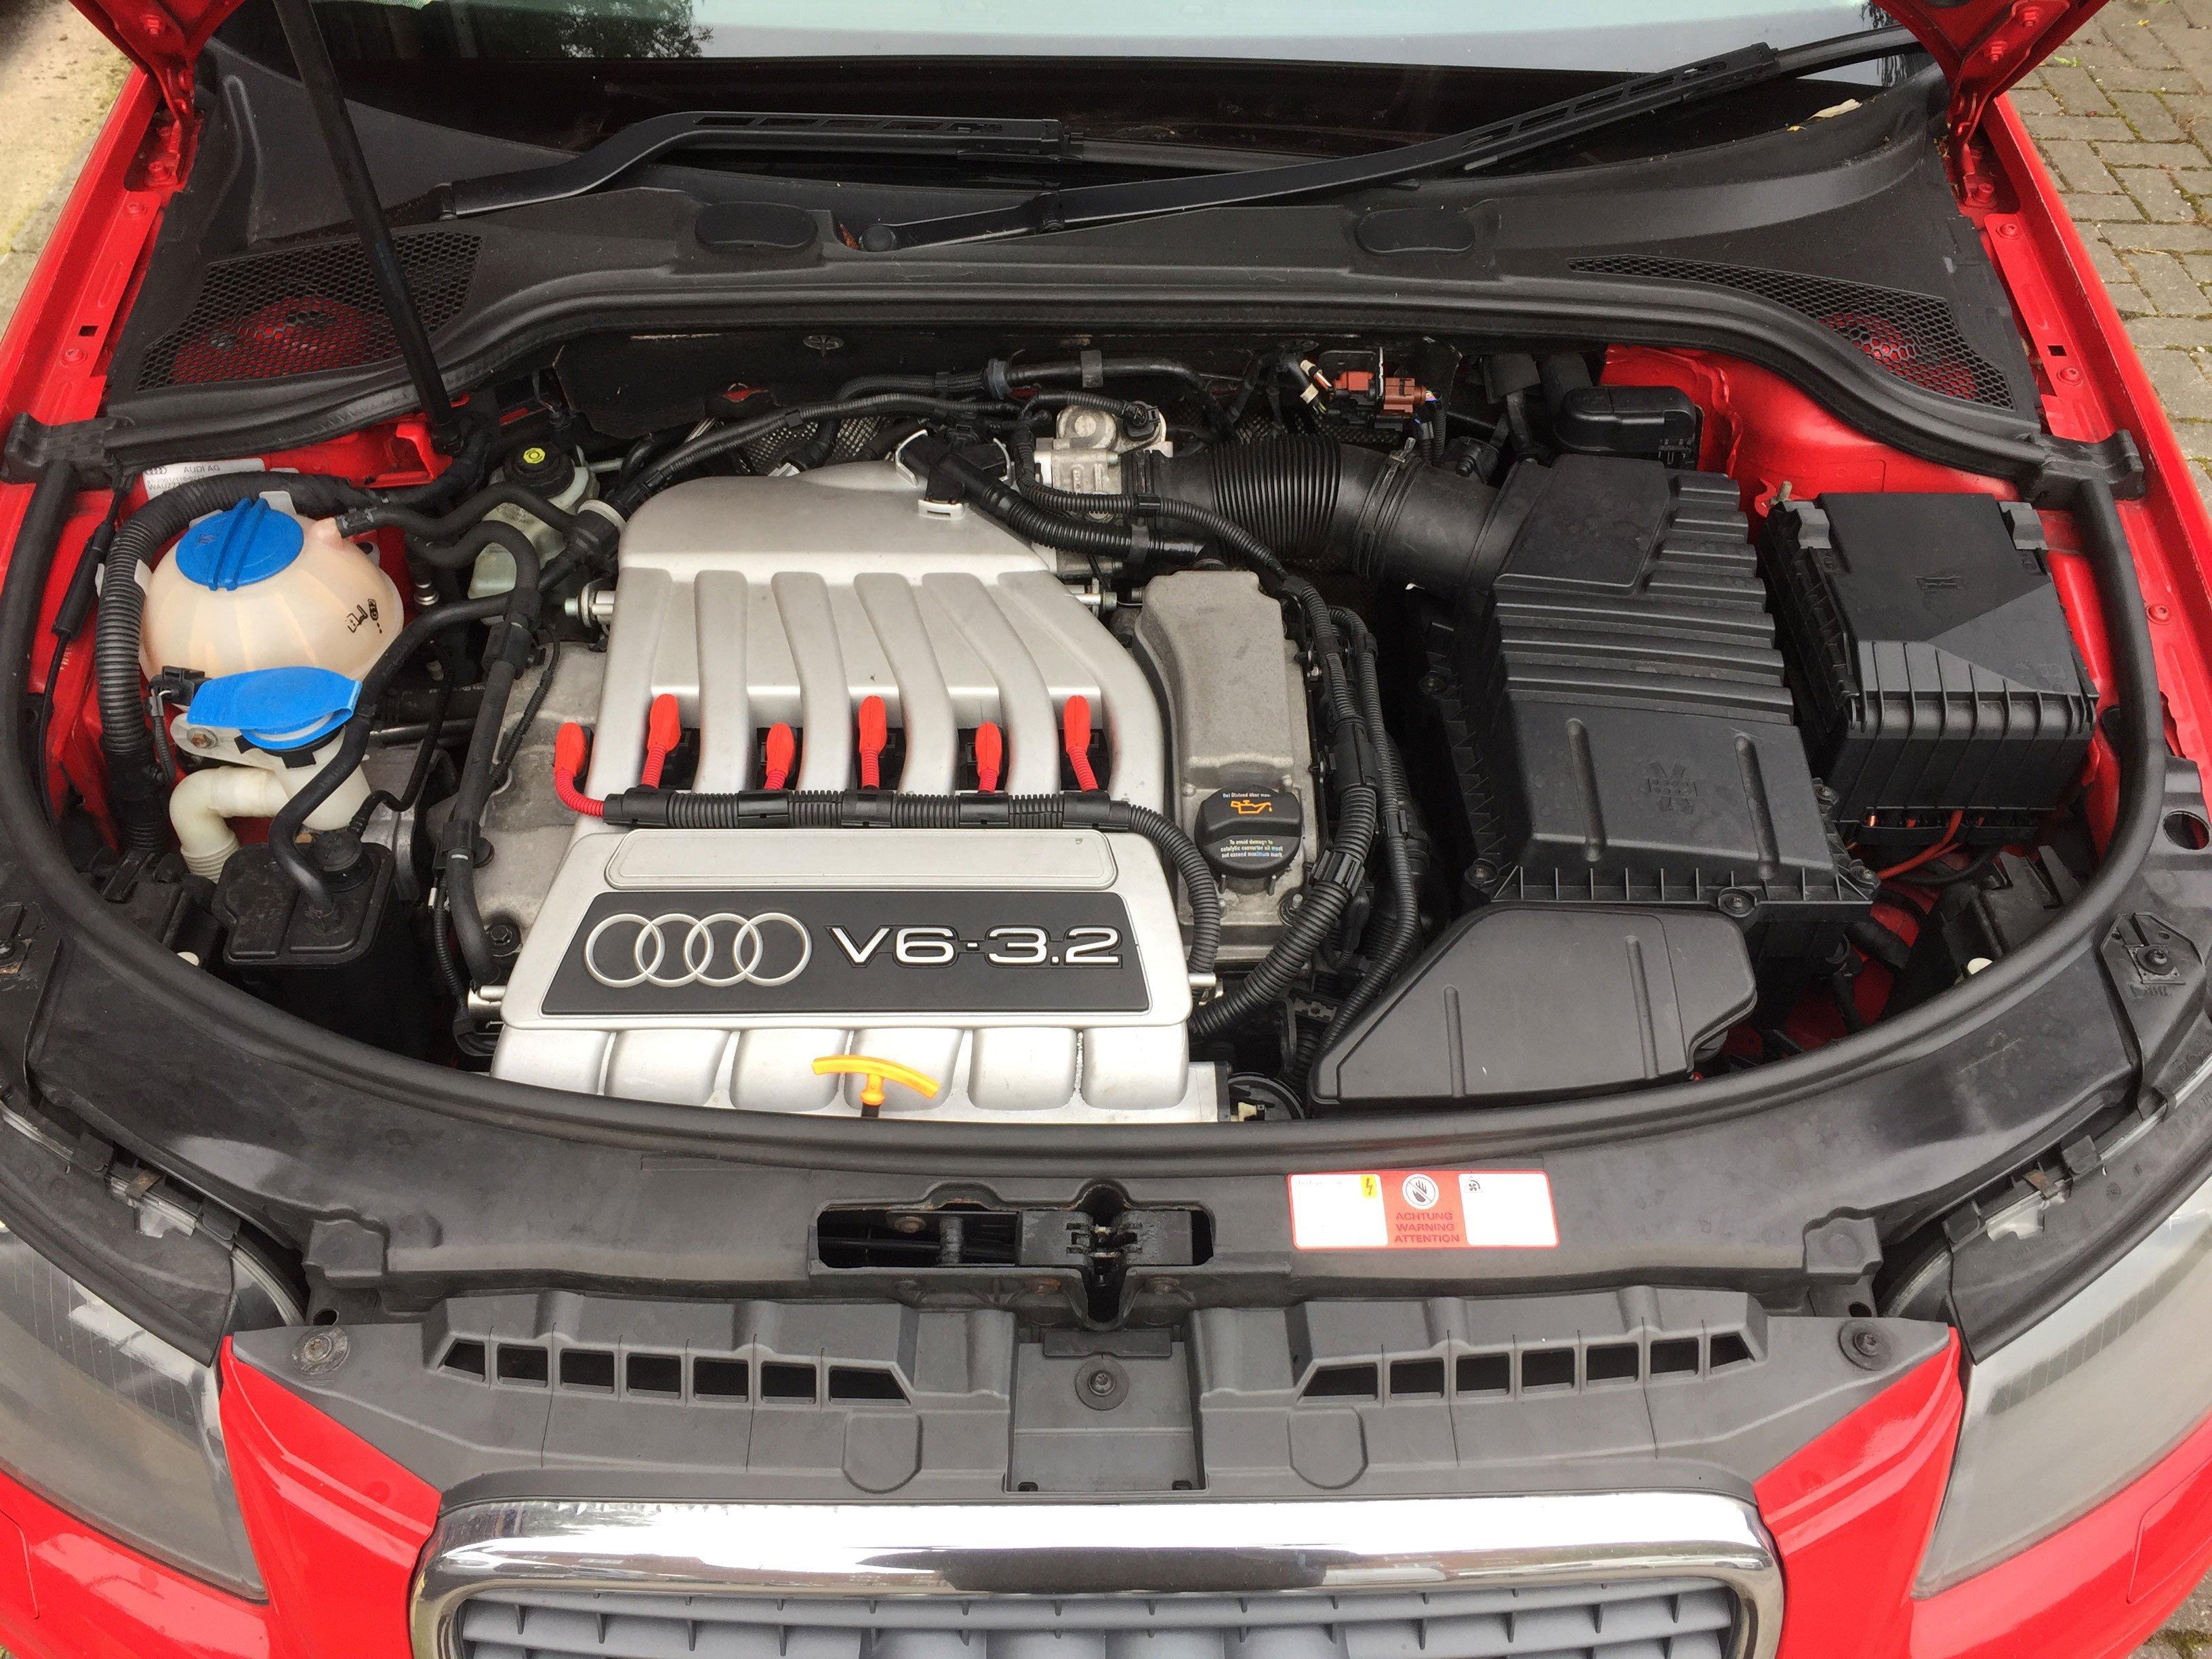 Kelebihan Audi A3 3.2 Quattro Murah Berkualitas